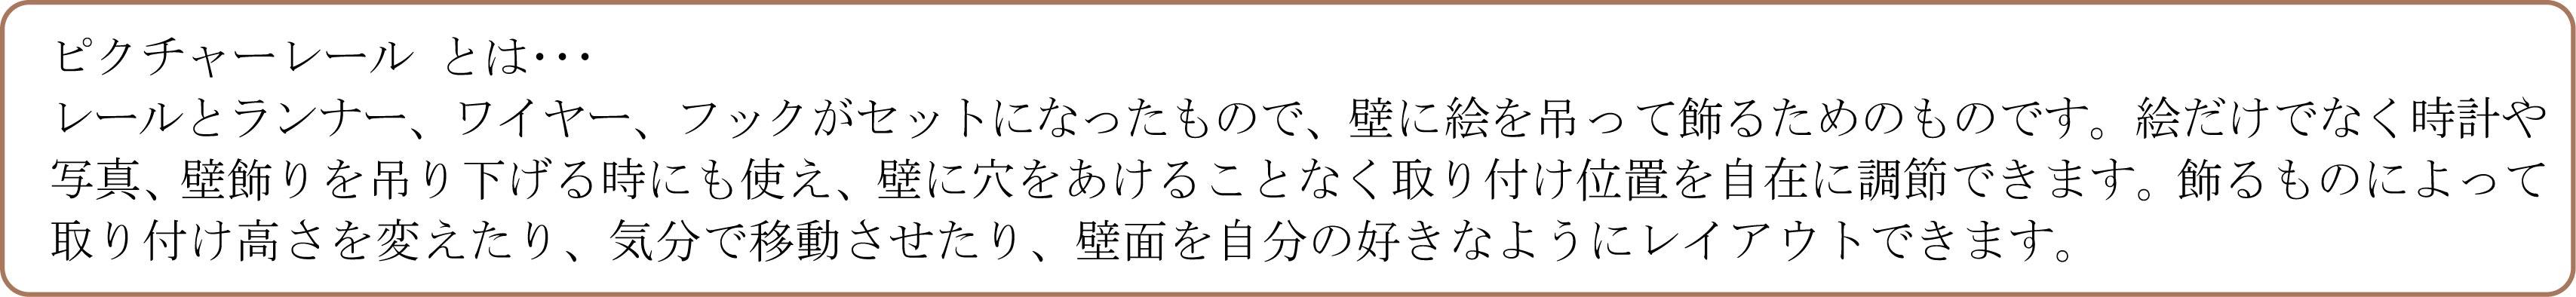 KuraSi-natu-sin77-08.jpg